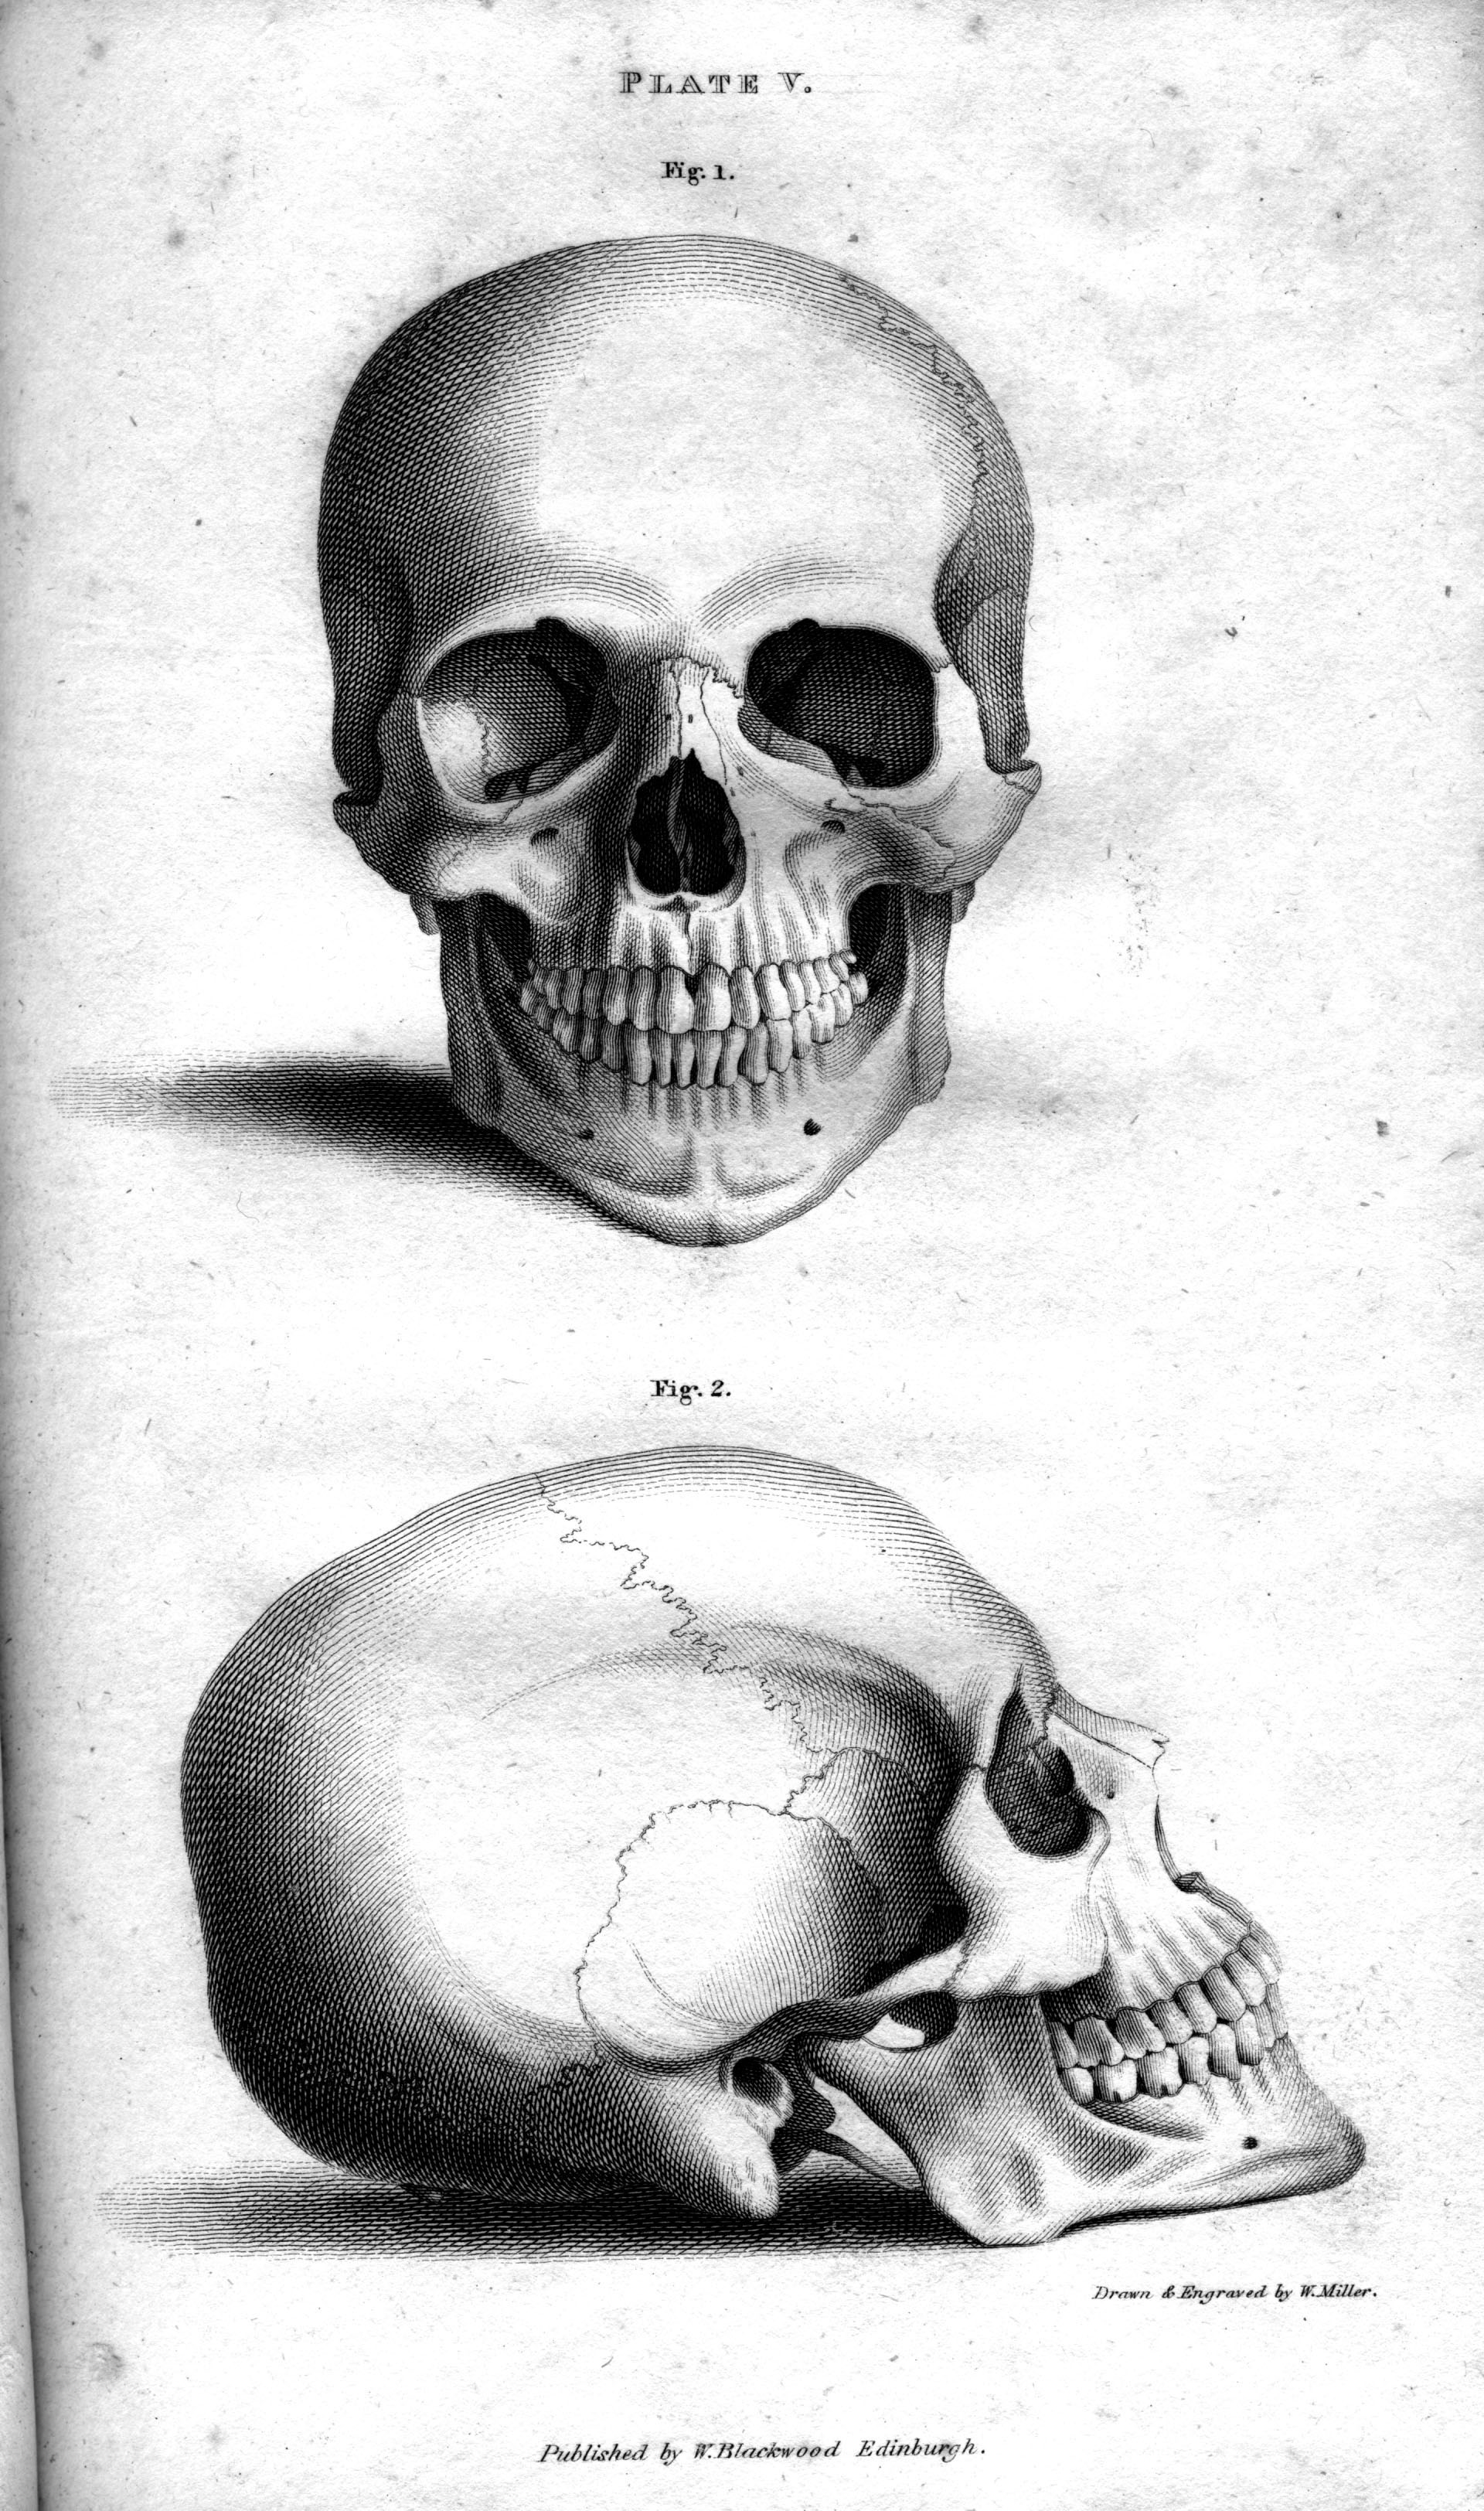 Drawn sleleton head bone Illustrations Meditations Room Archaeology Illustrations